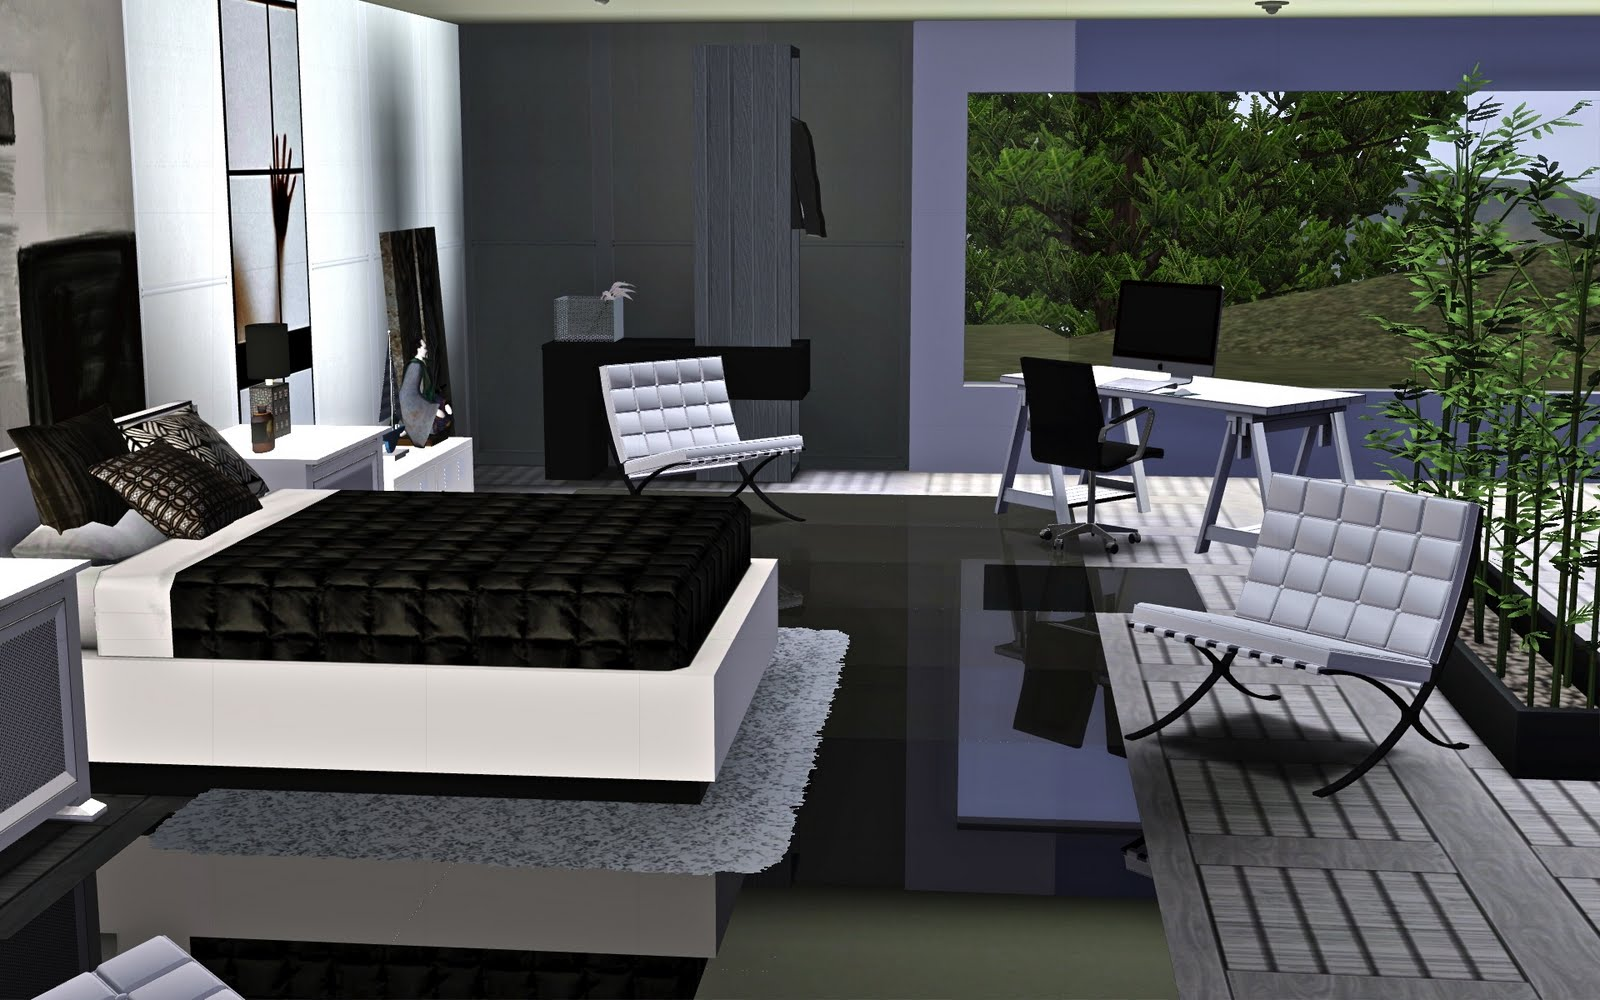 Le blog de guijobo ambiance chambre r ve blanc - Ambiance chambre ...